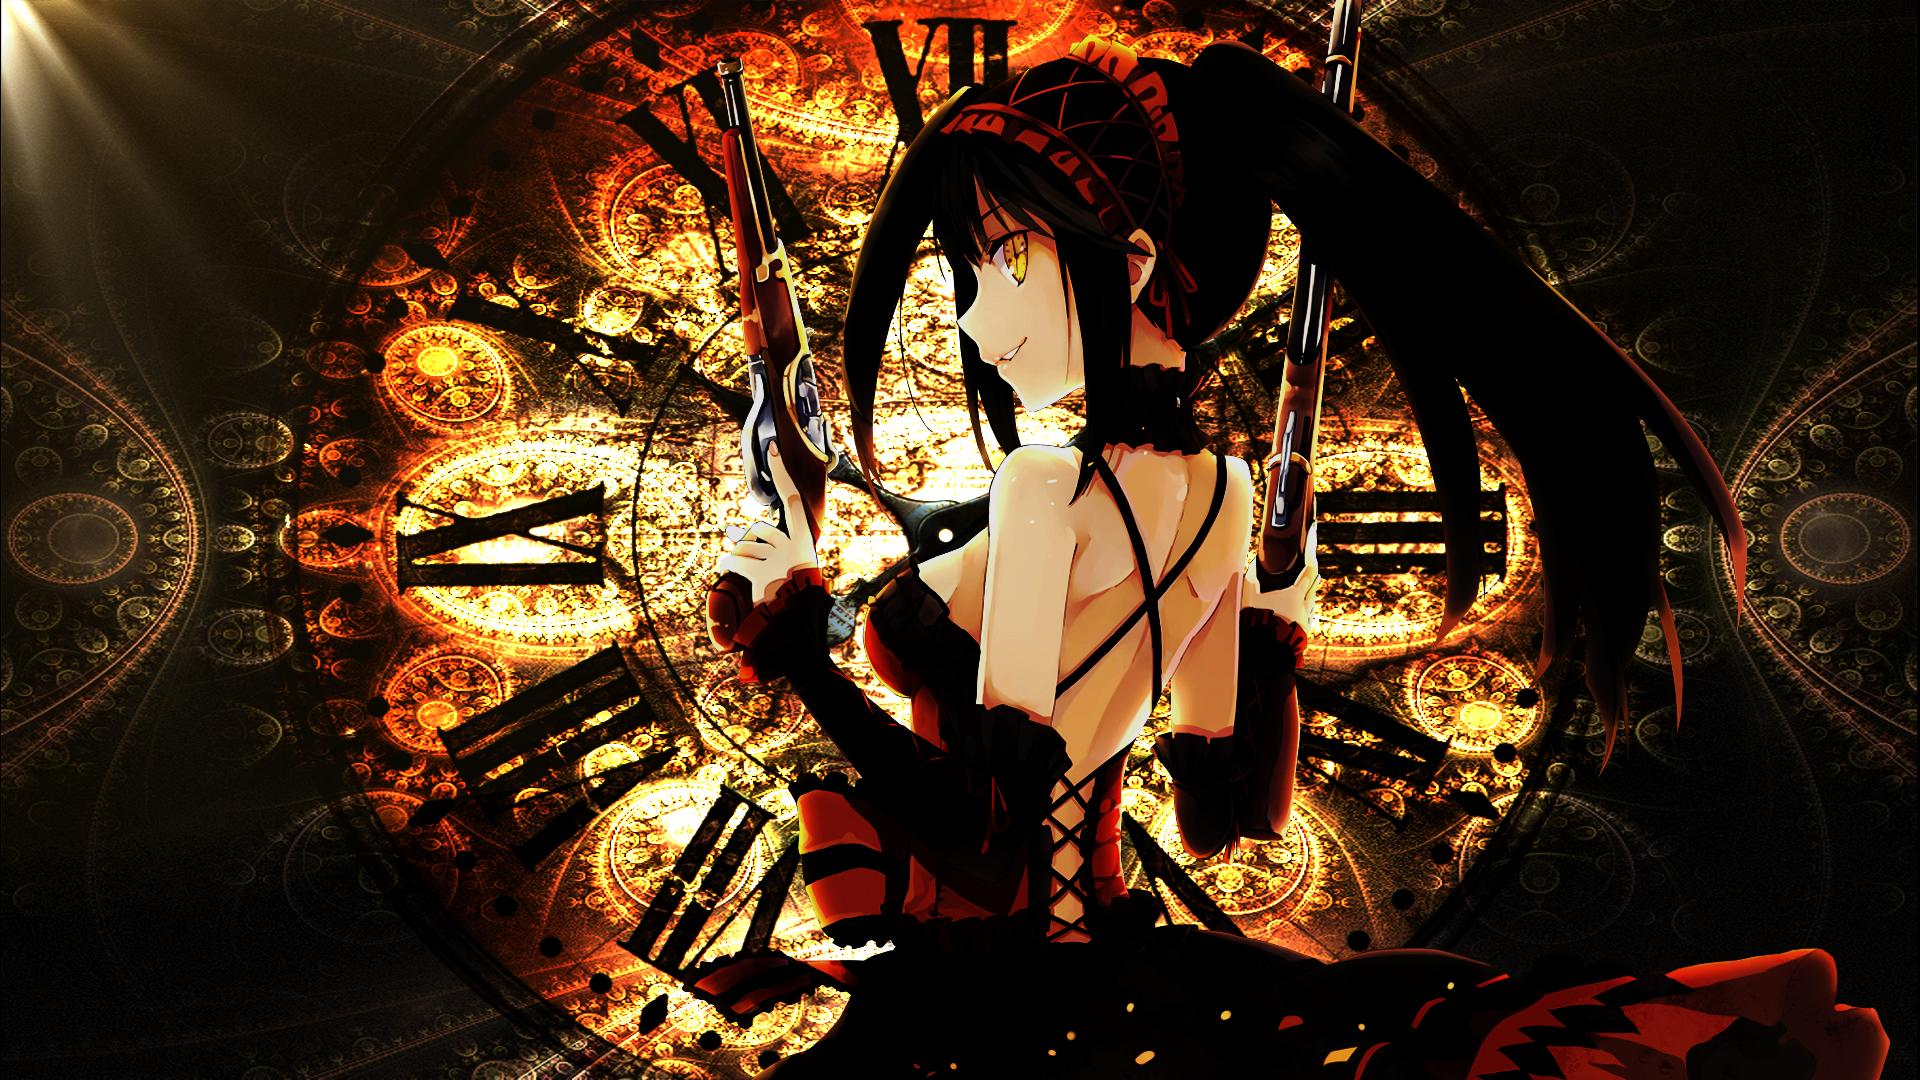 Free Download Kurumi Tokisaki Date A Live Anime Hd Wallpaper X